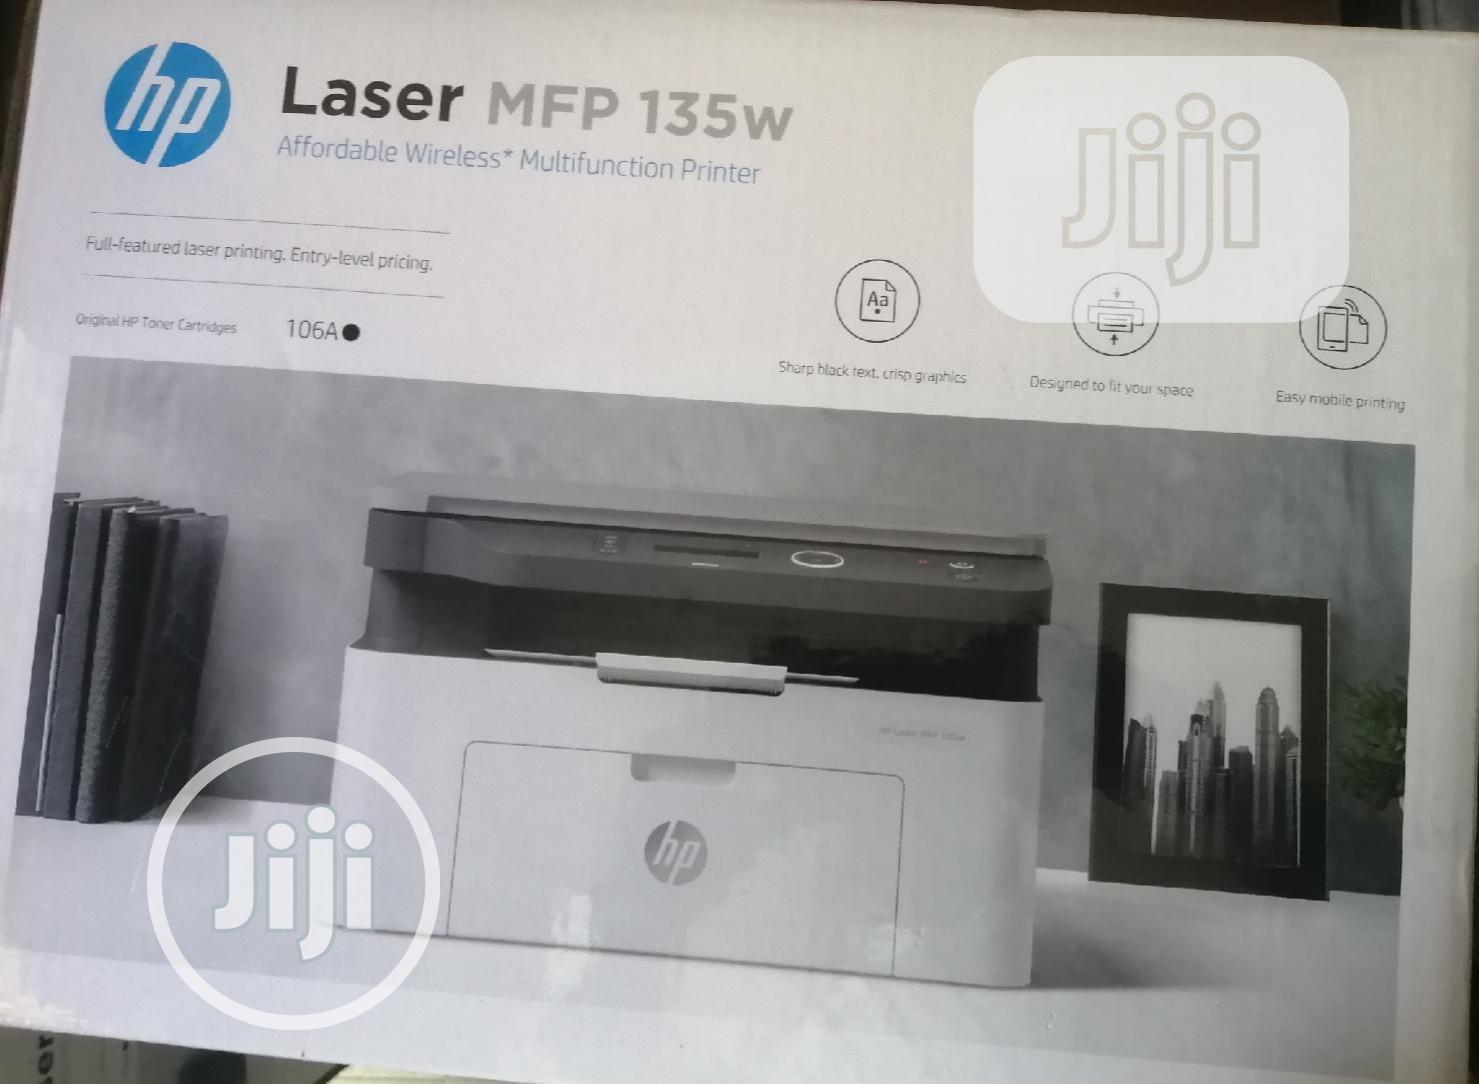 HP Hp Laserjet M135w Wireless Mfp Printer.   Printers & Scanners for sale in Ikeja, Lagos State, Nigeria